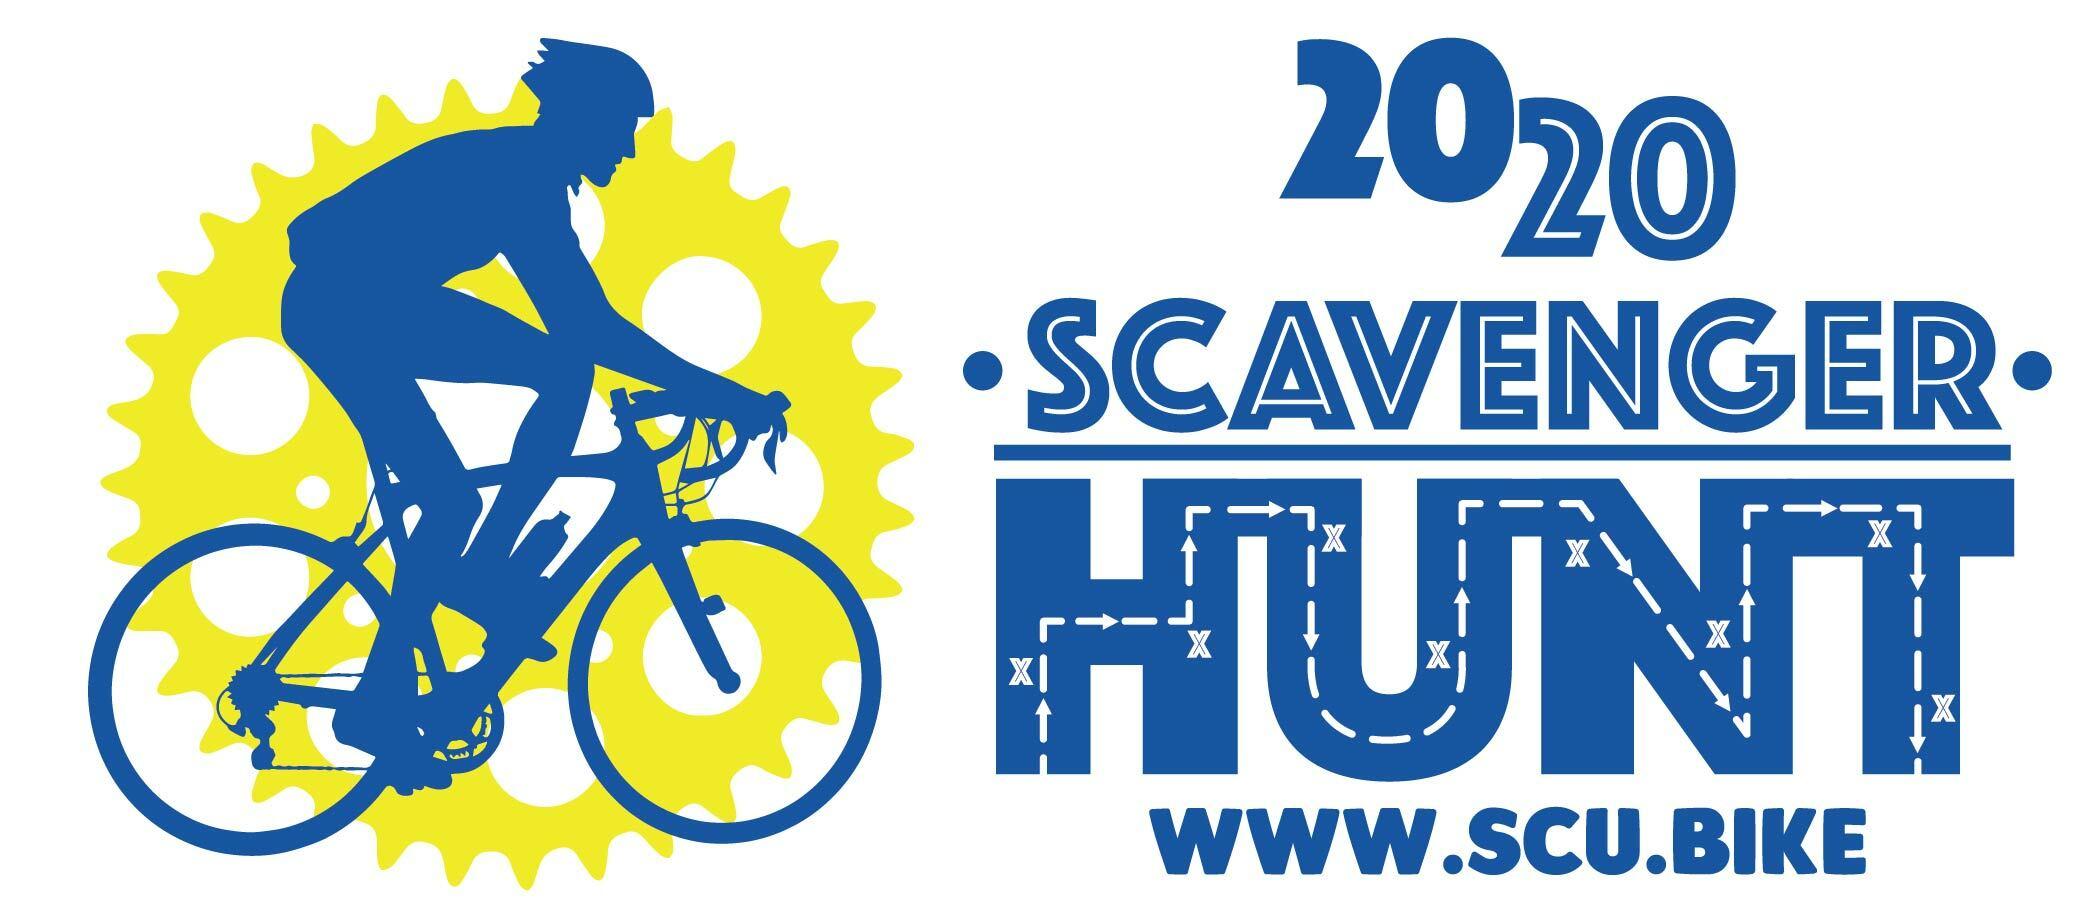 SCU Scavenger Hunt 2020